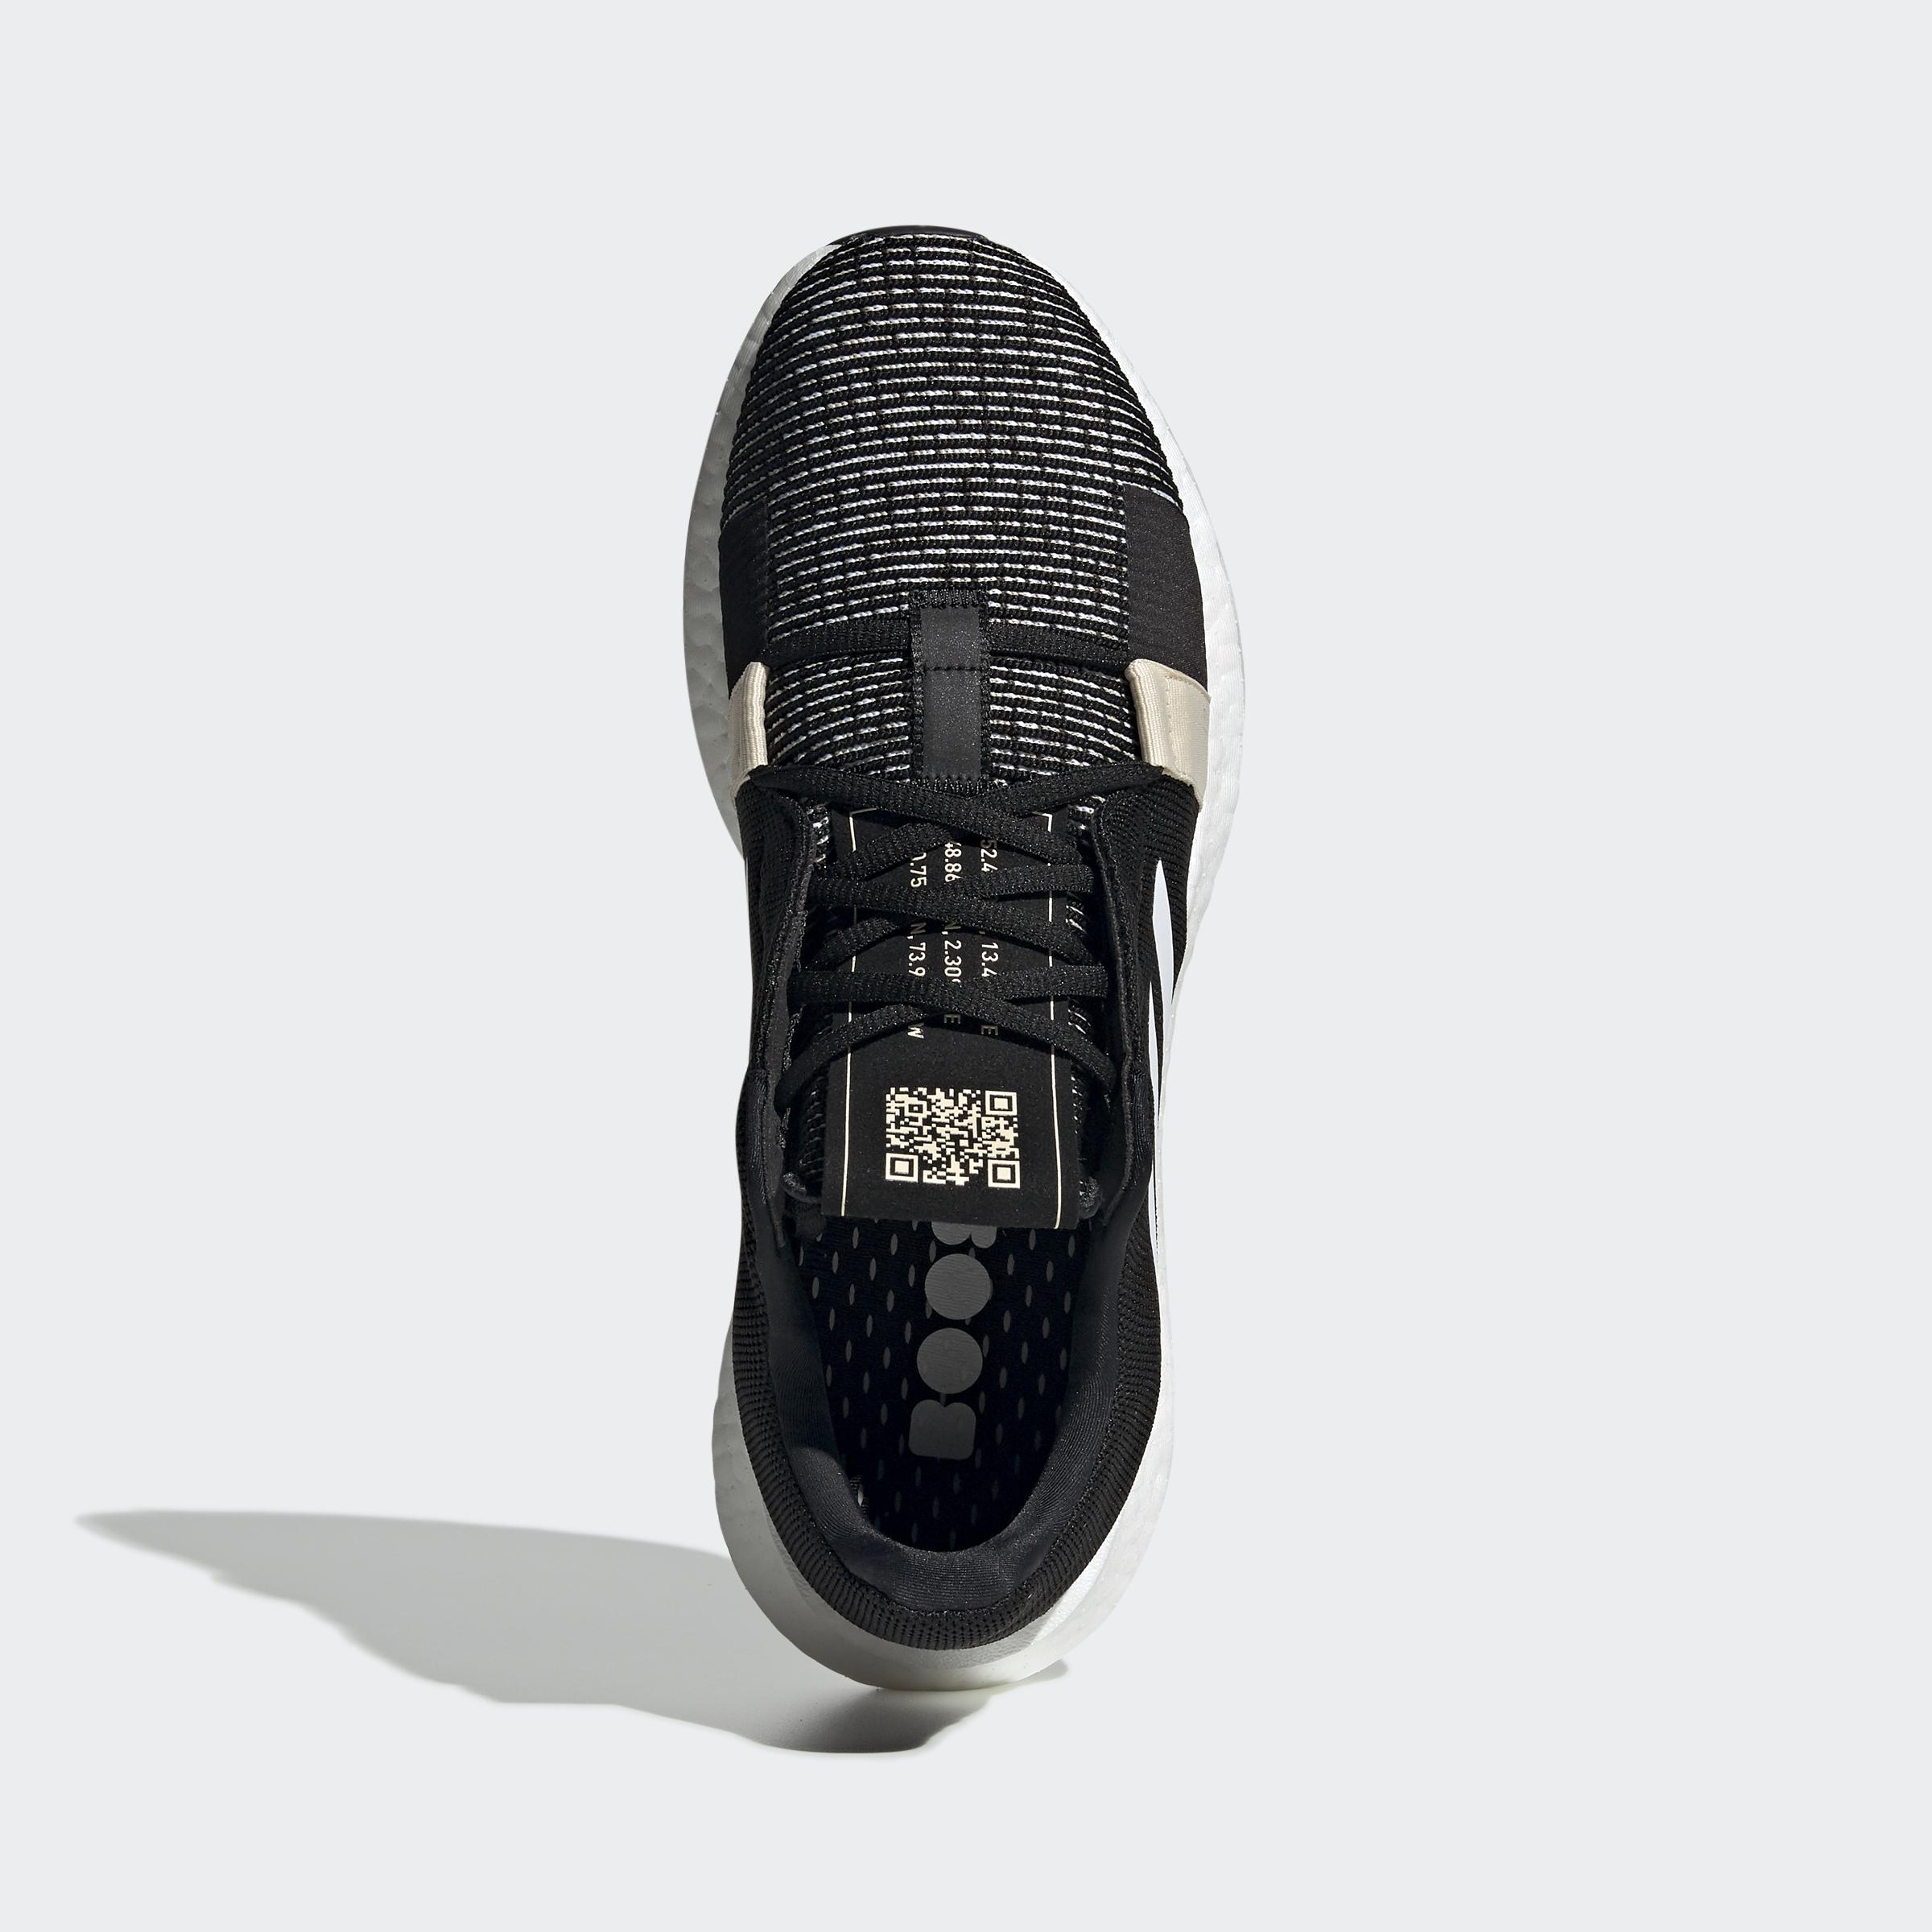 miniature 41 - adidas Senseboost Go Shoes Men's Athletic & Sneakers